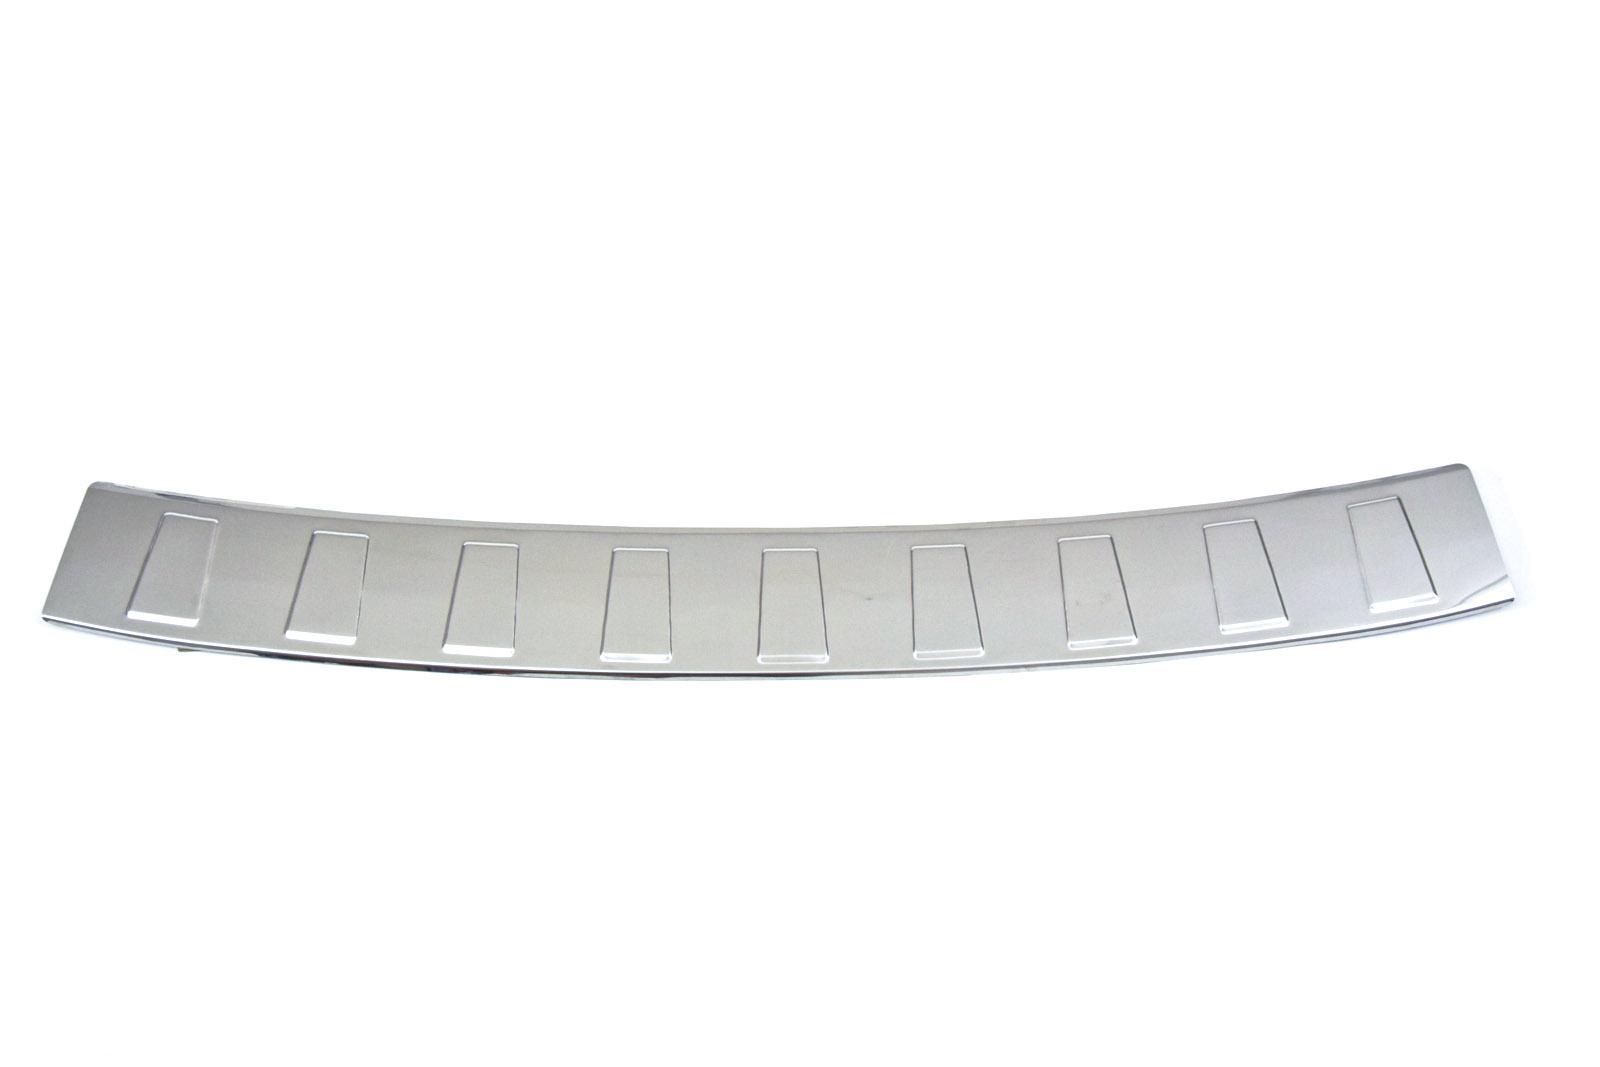 Nerezový kryt náraznika BMW X6 E71 2010-2013